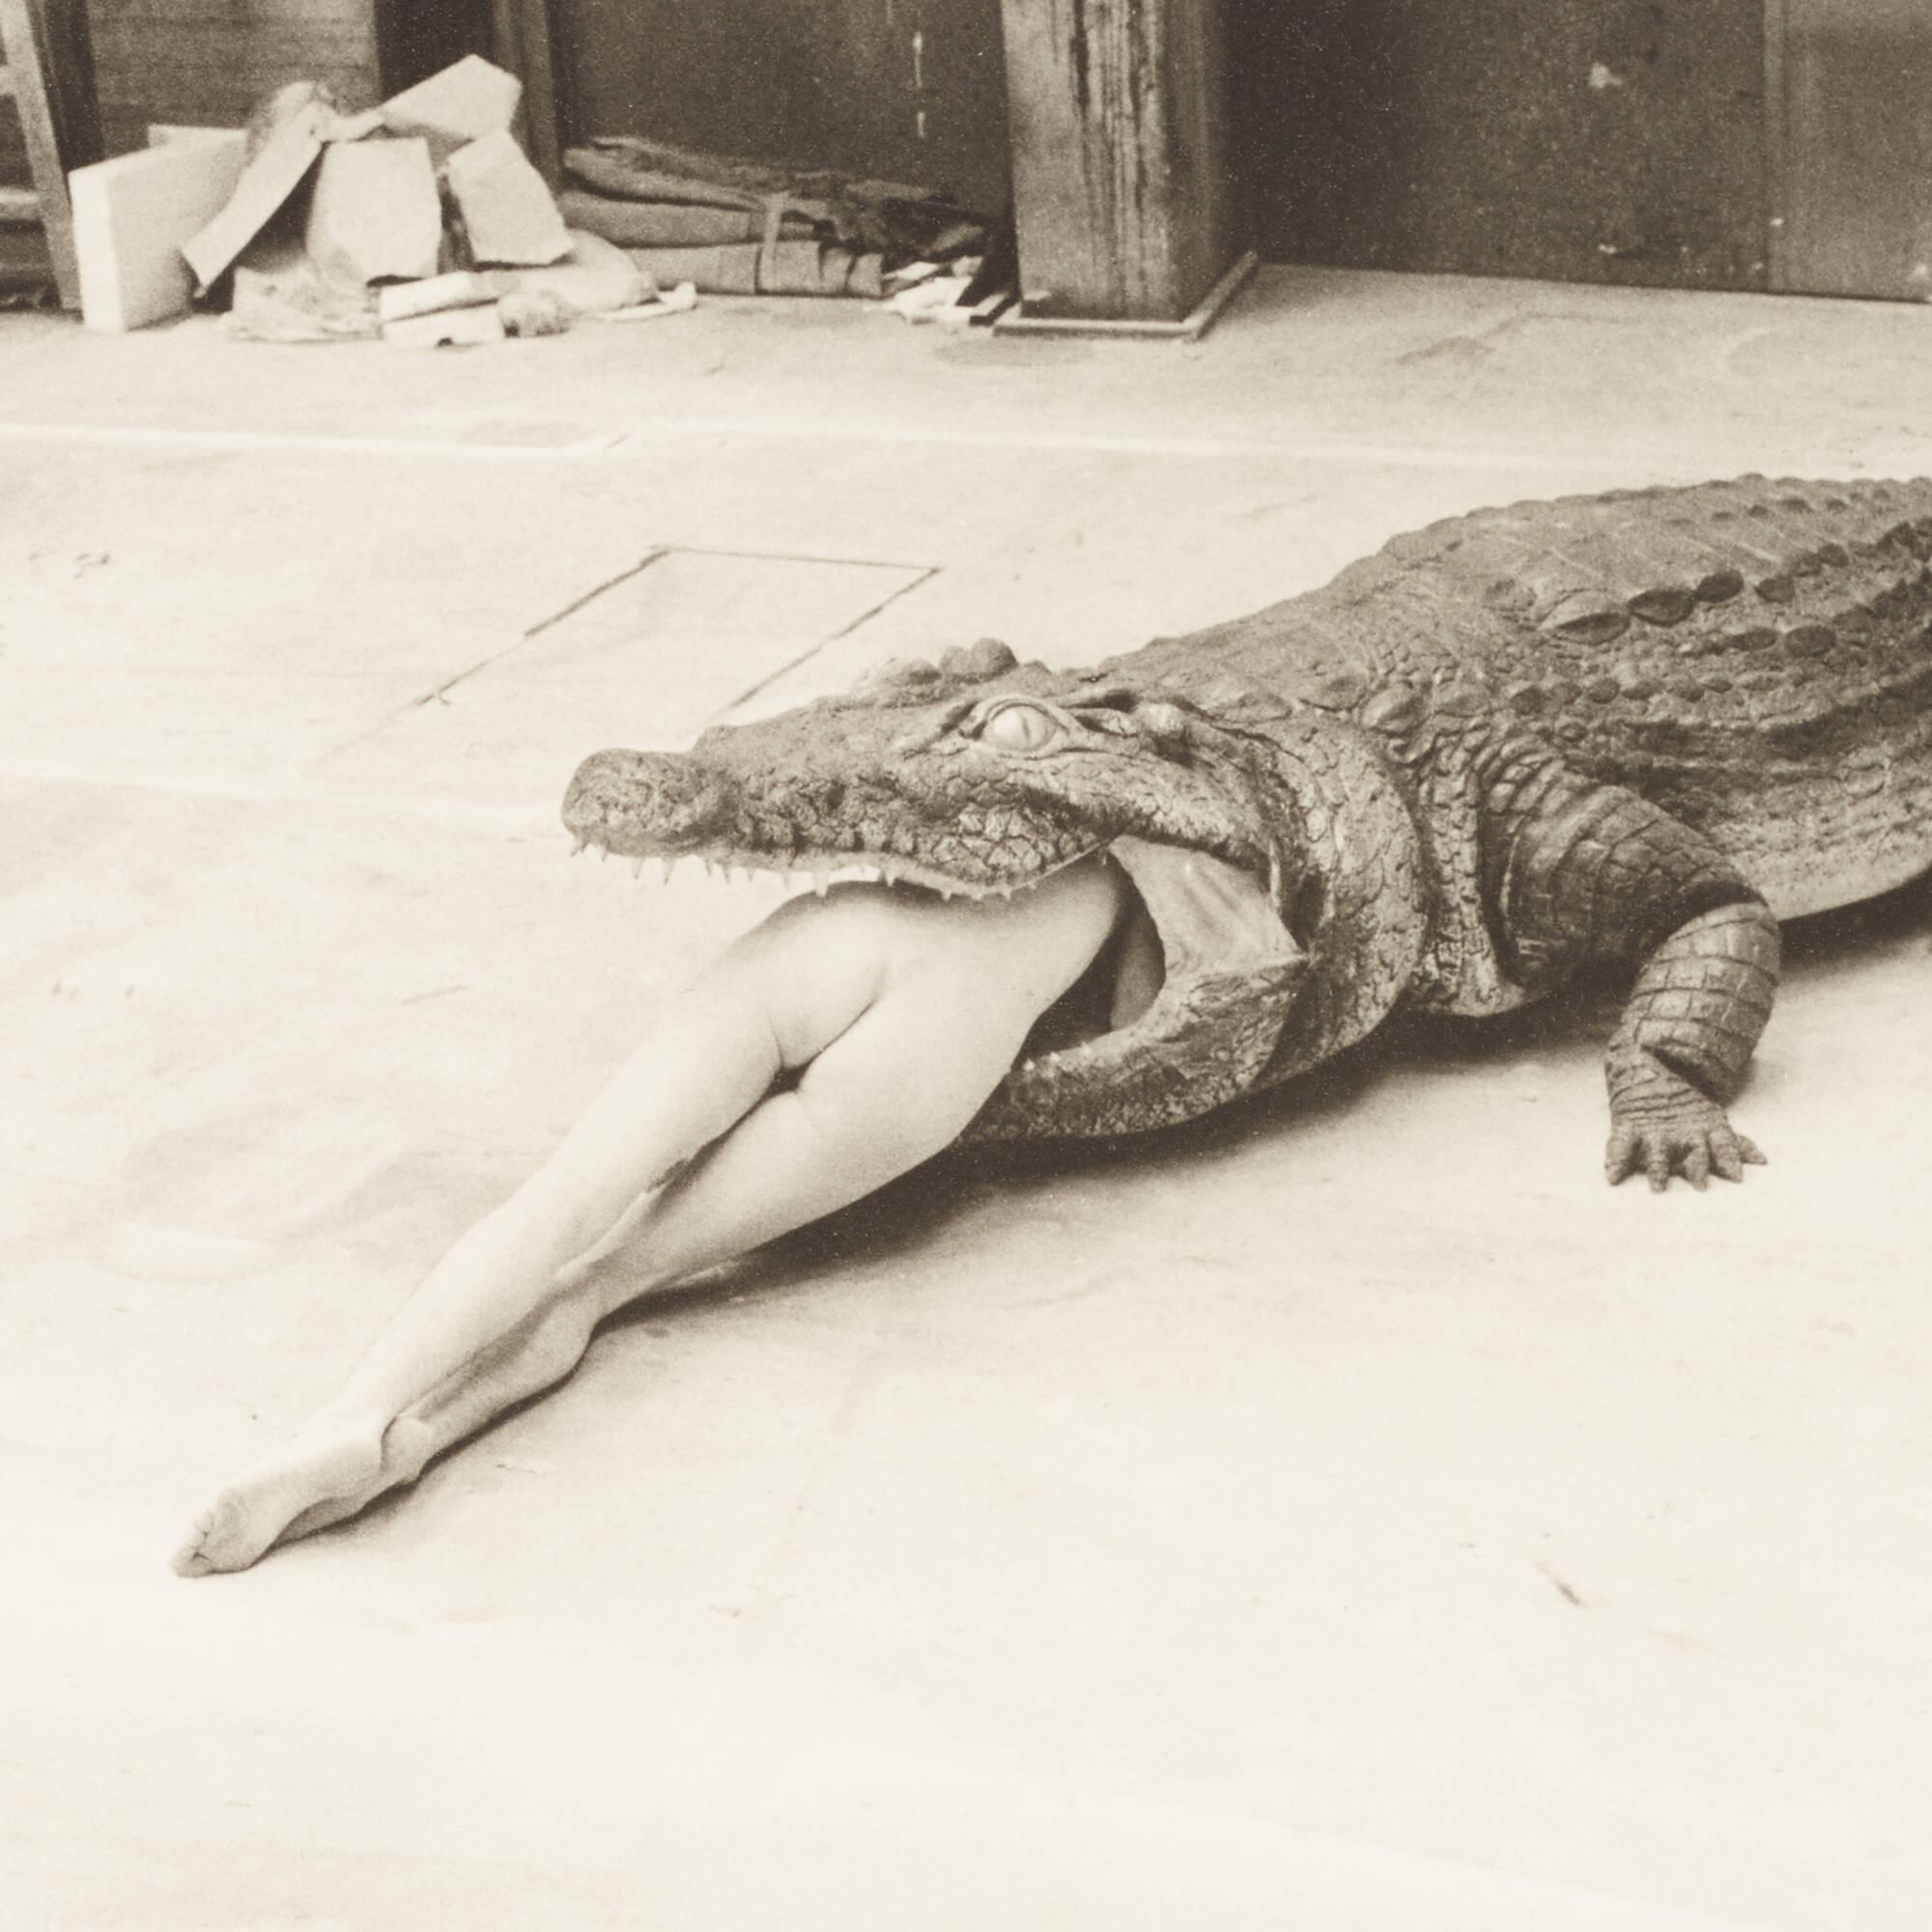 292: Helmut Newton / Crocodile Eating Ballerina (2 of 3)